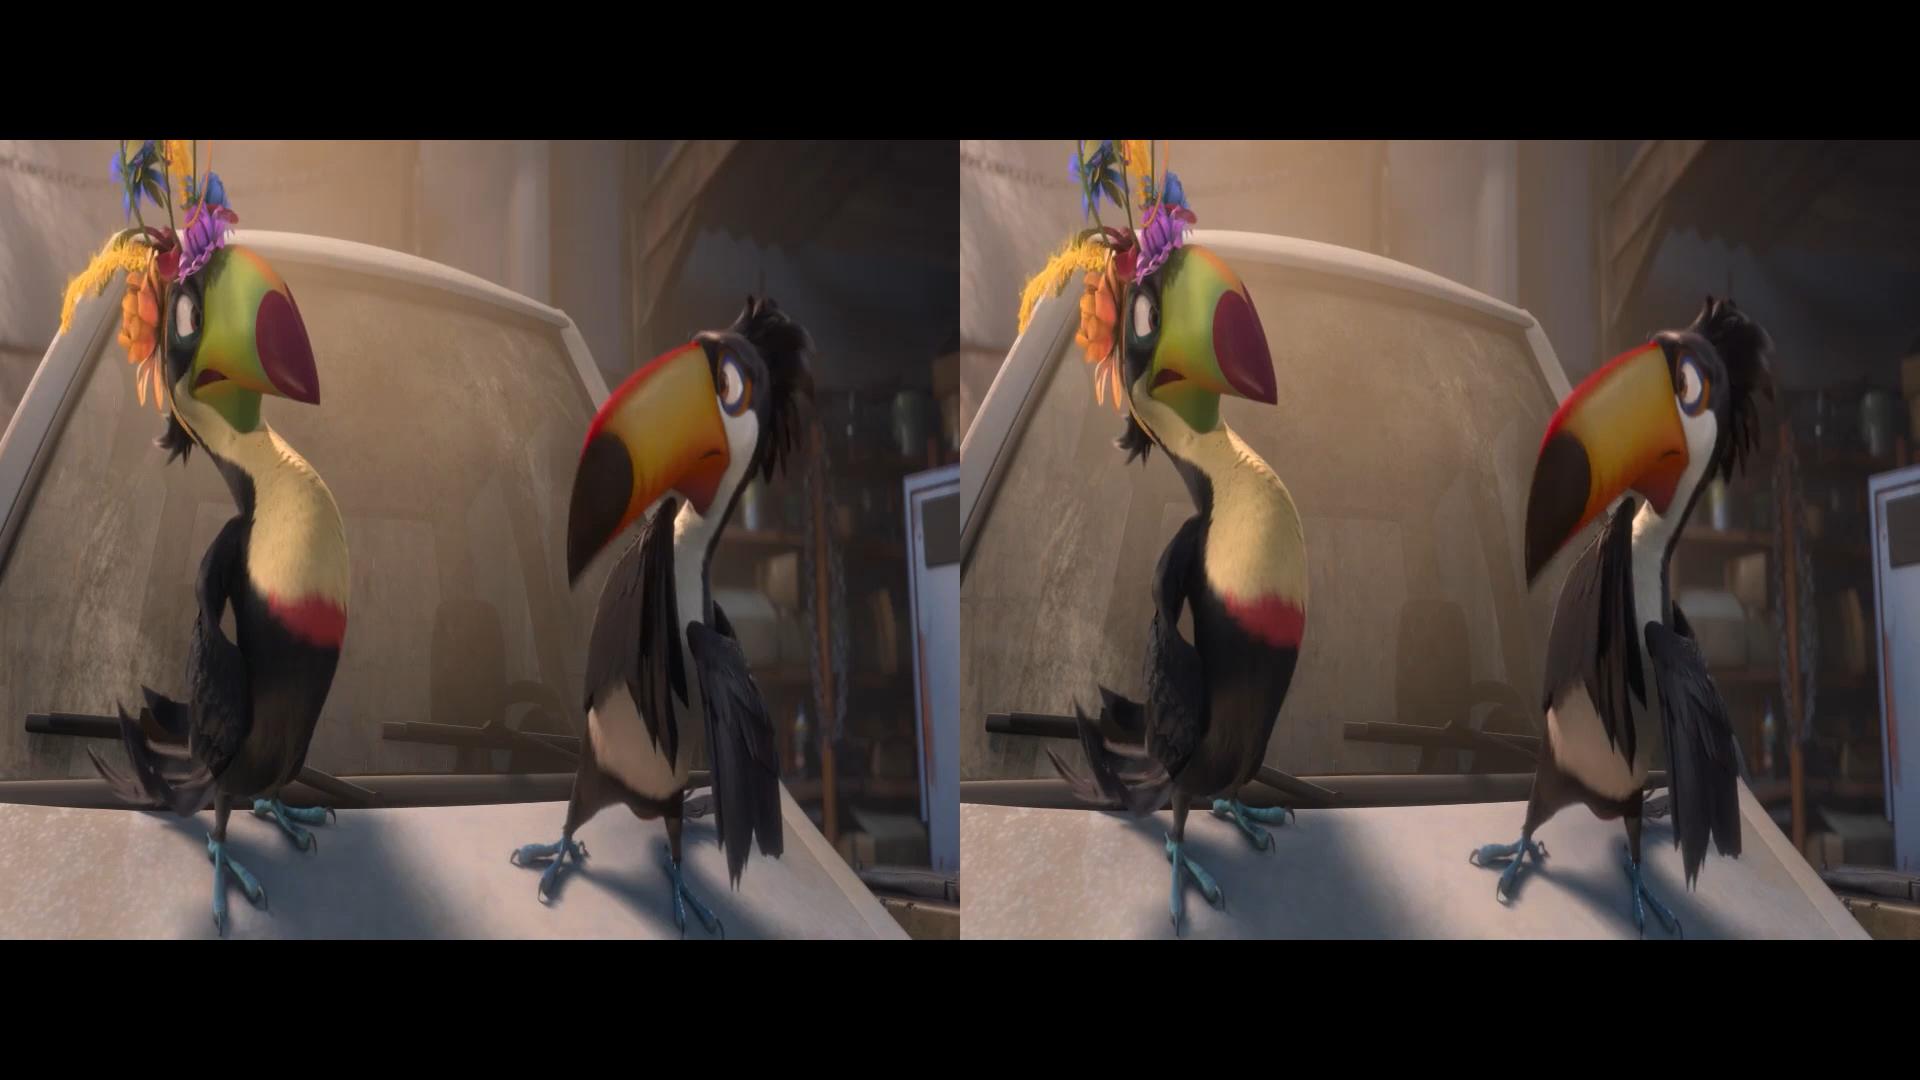 Rio 2 (2014) - 1080p 3D - DuaL - Türkçe Dublaj Torrent İndir